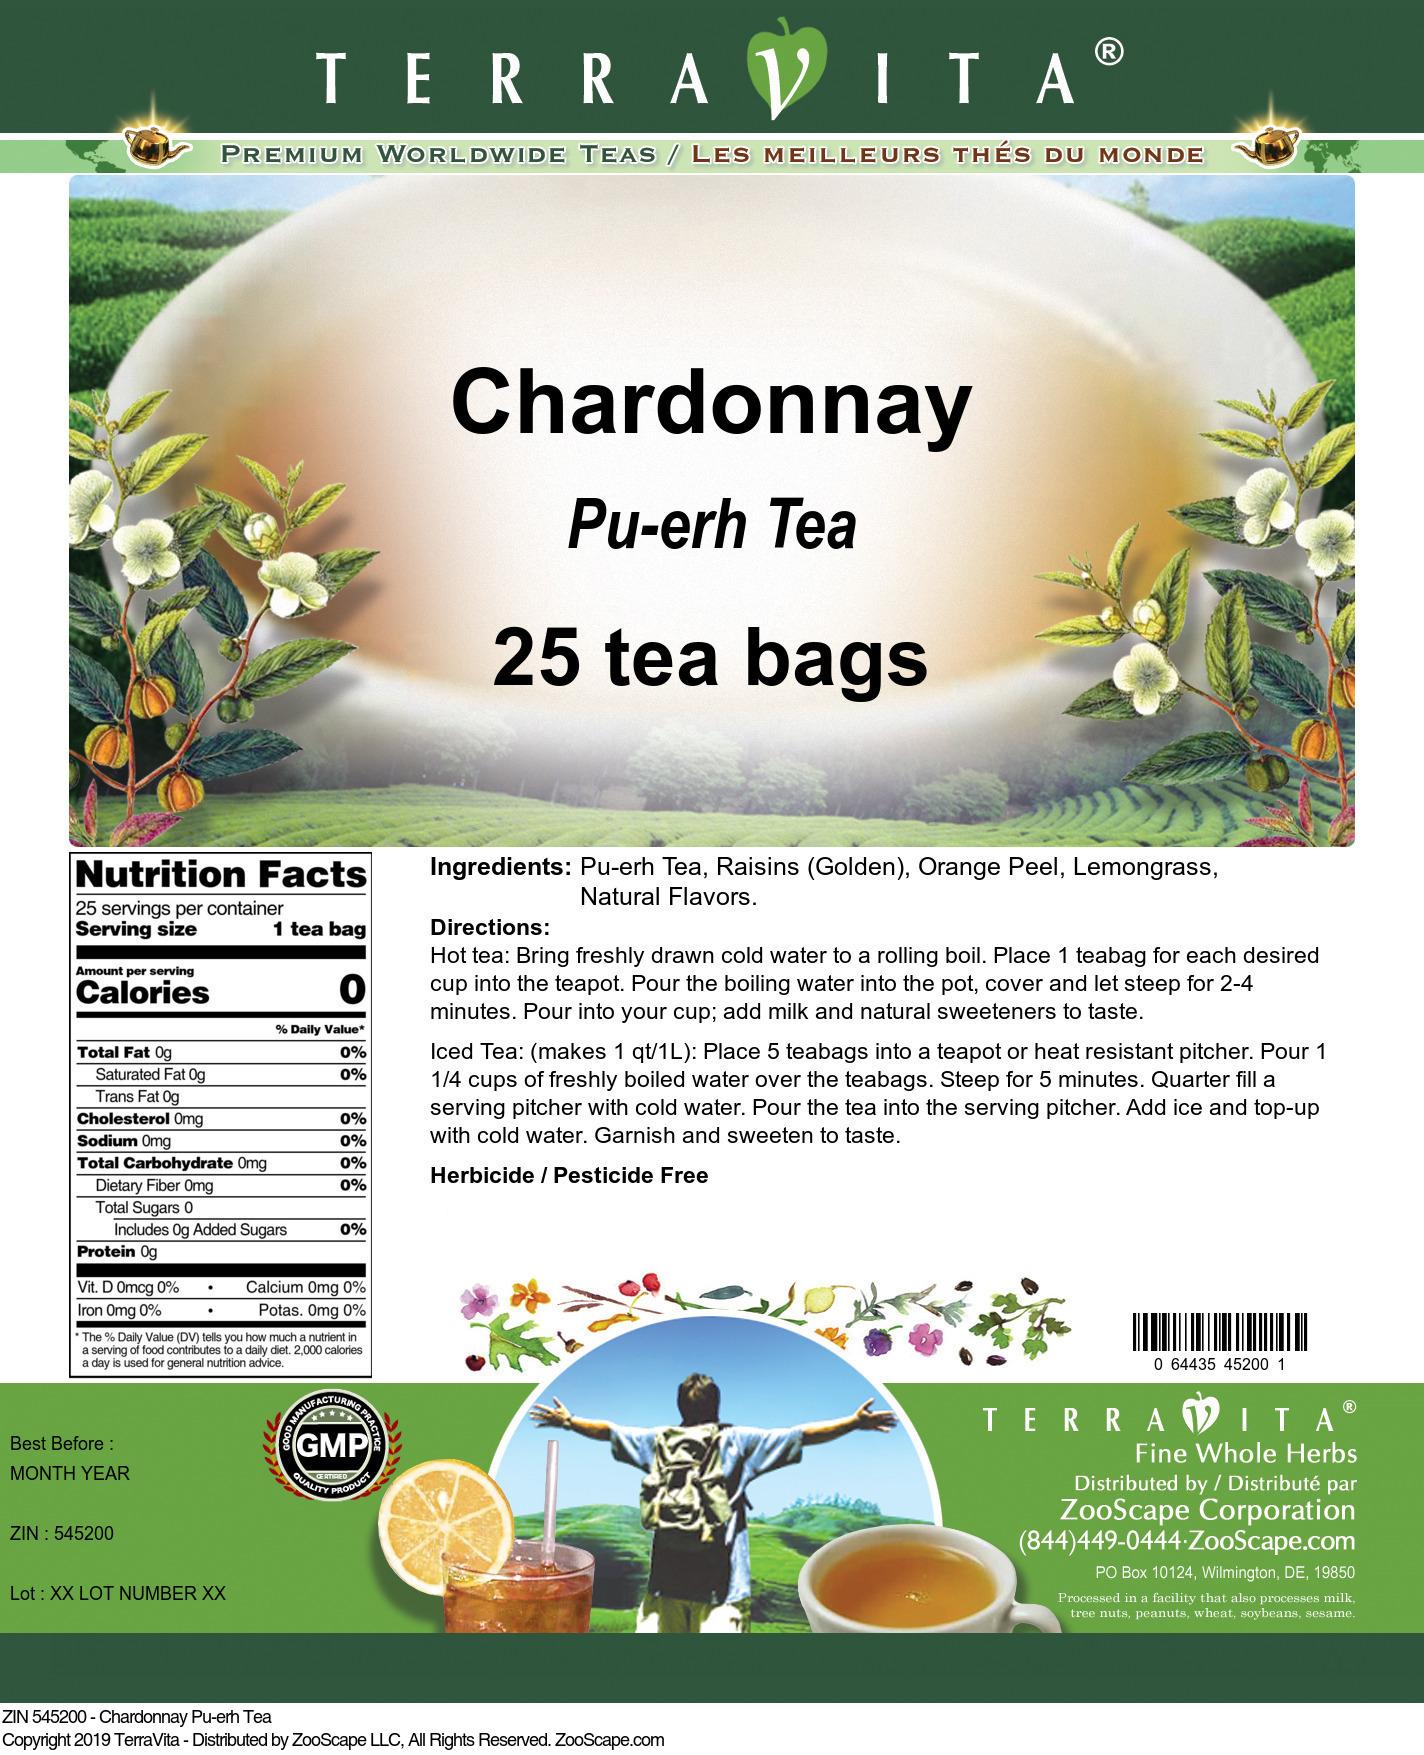 Chardonnay Pu-erh Tea